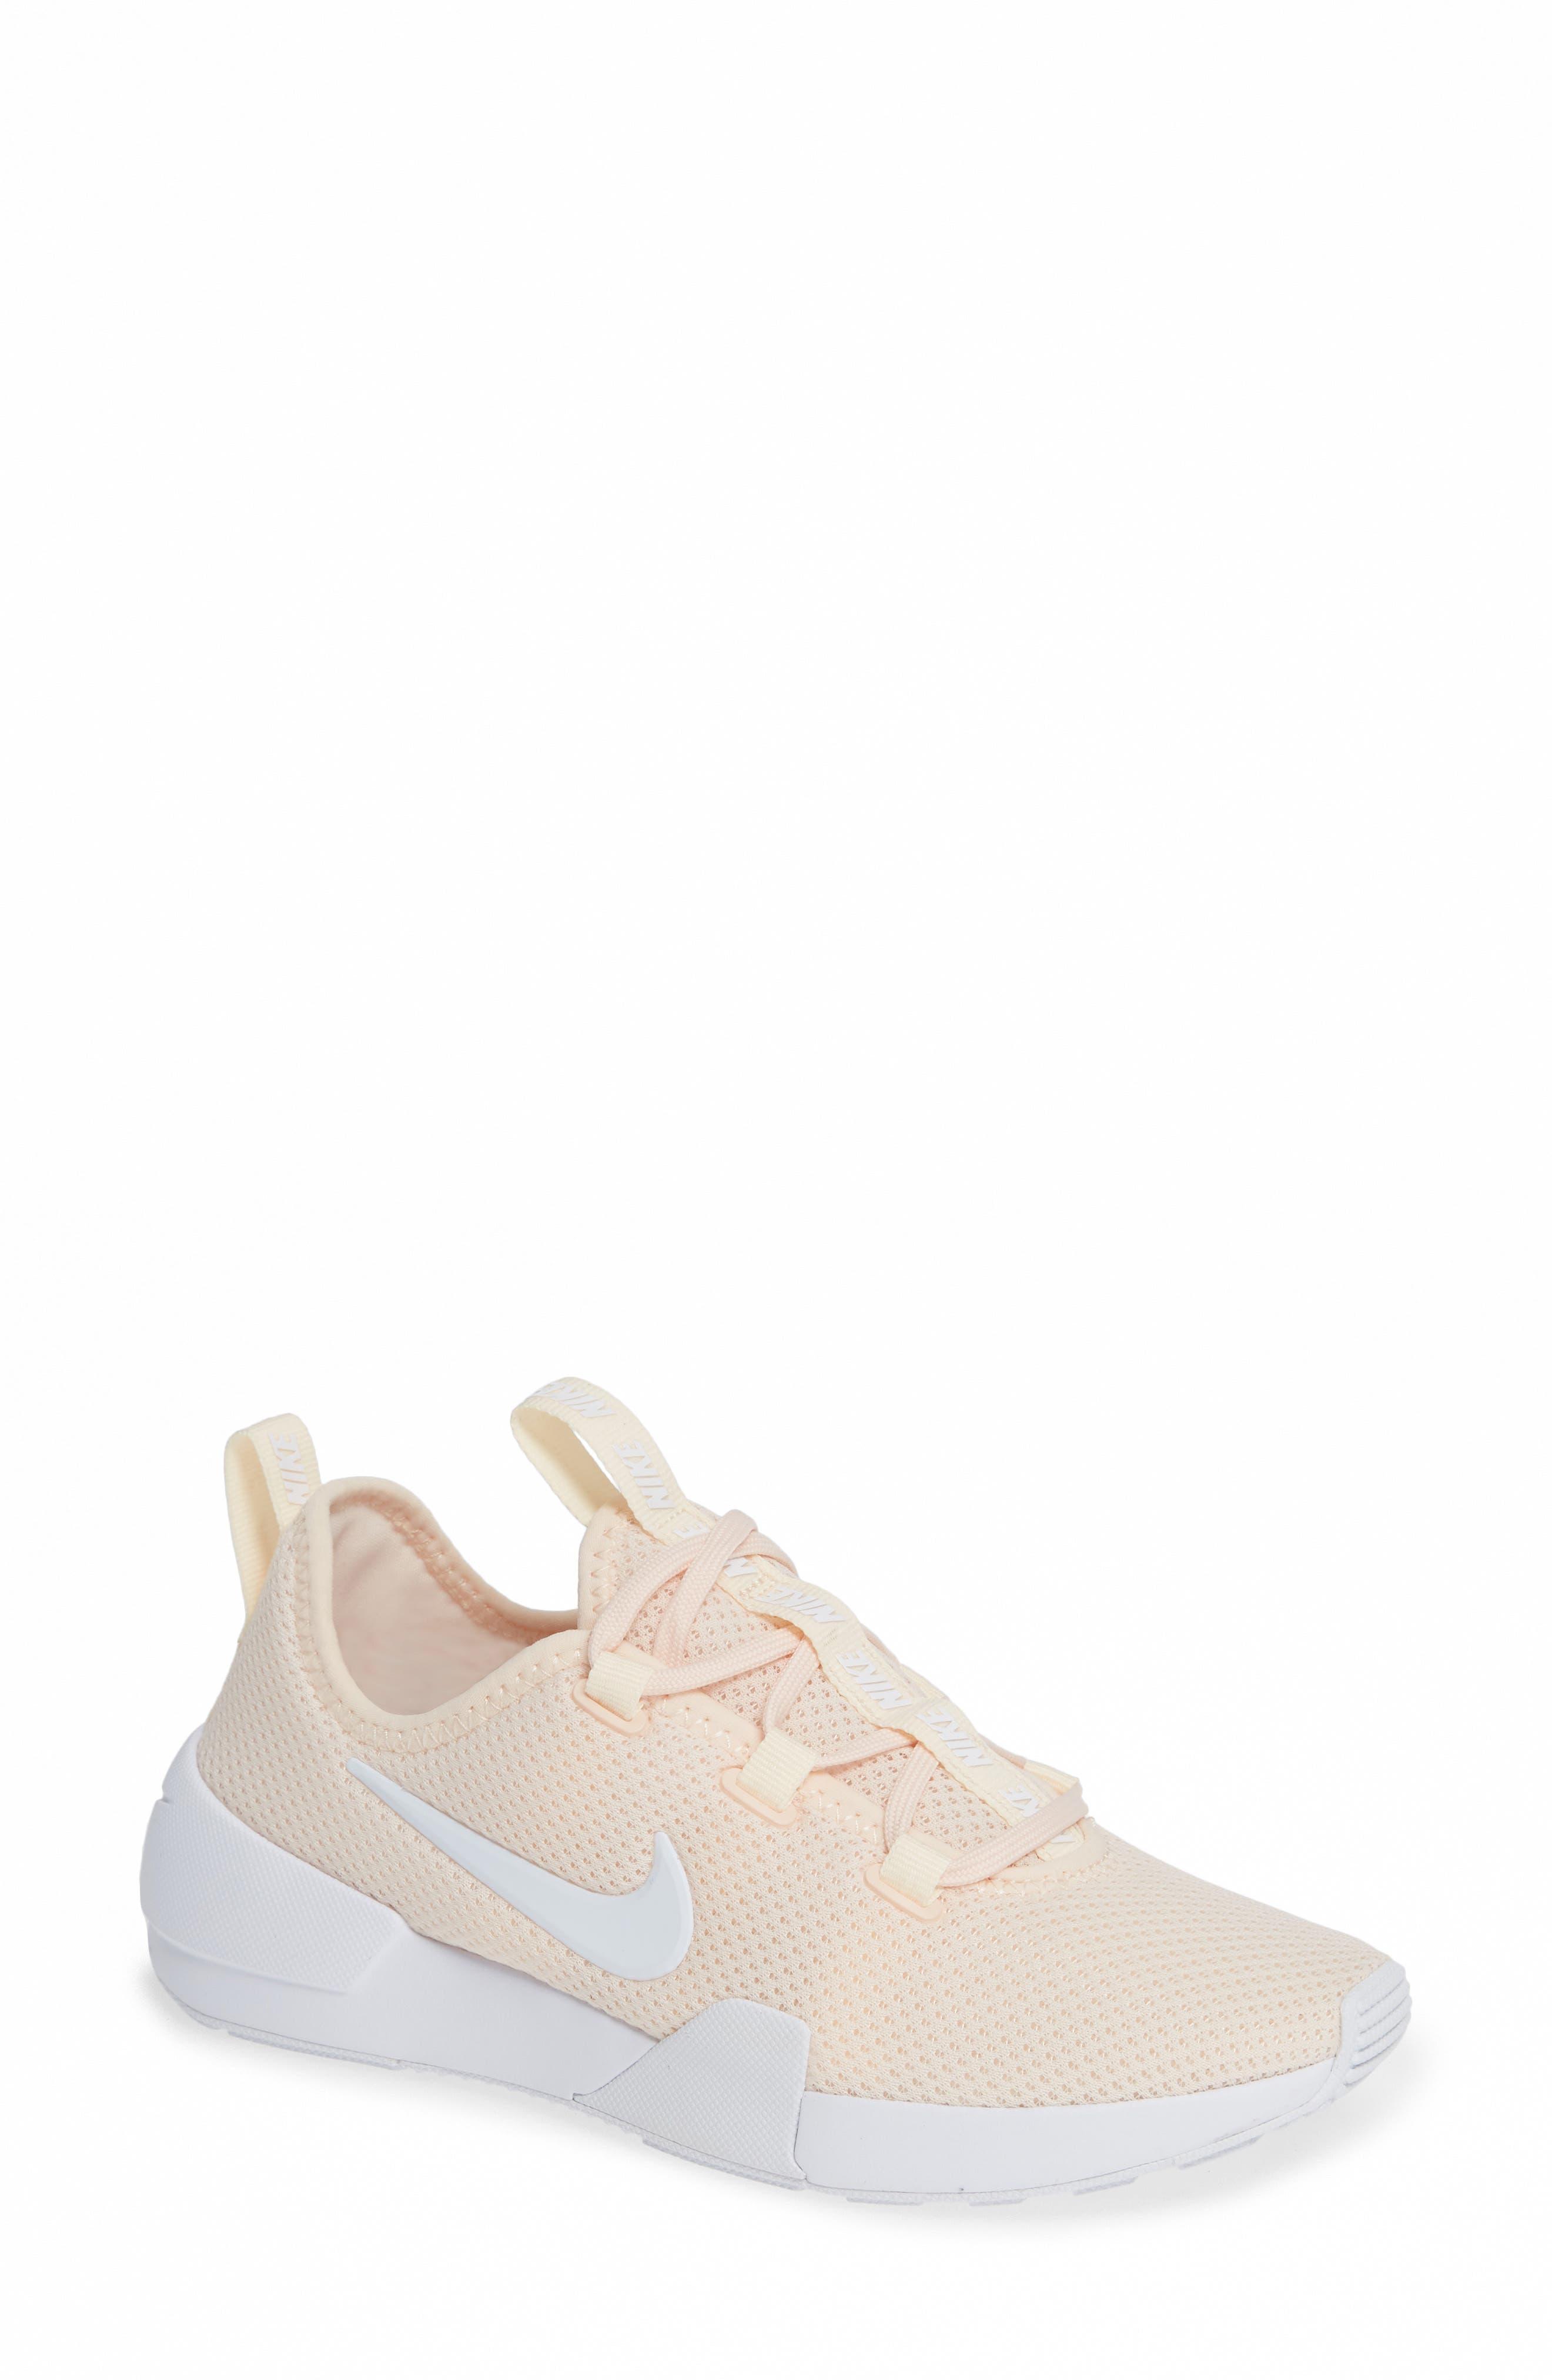 Ashin Modern Shoe,                             Main thumbnail 1, color,                             Guava Ice/ White/ White